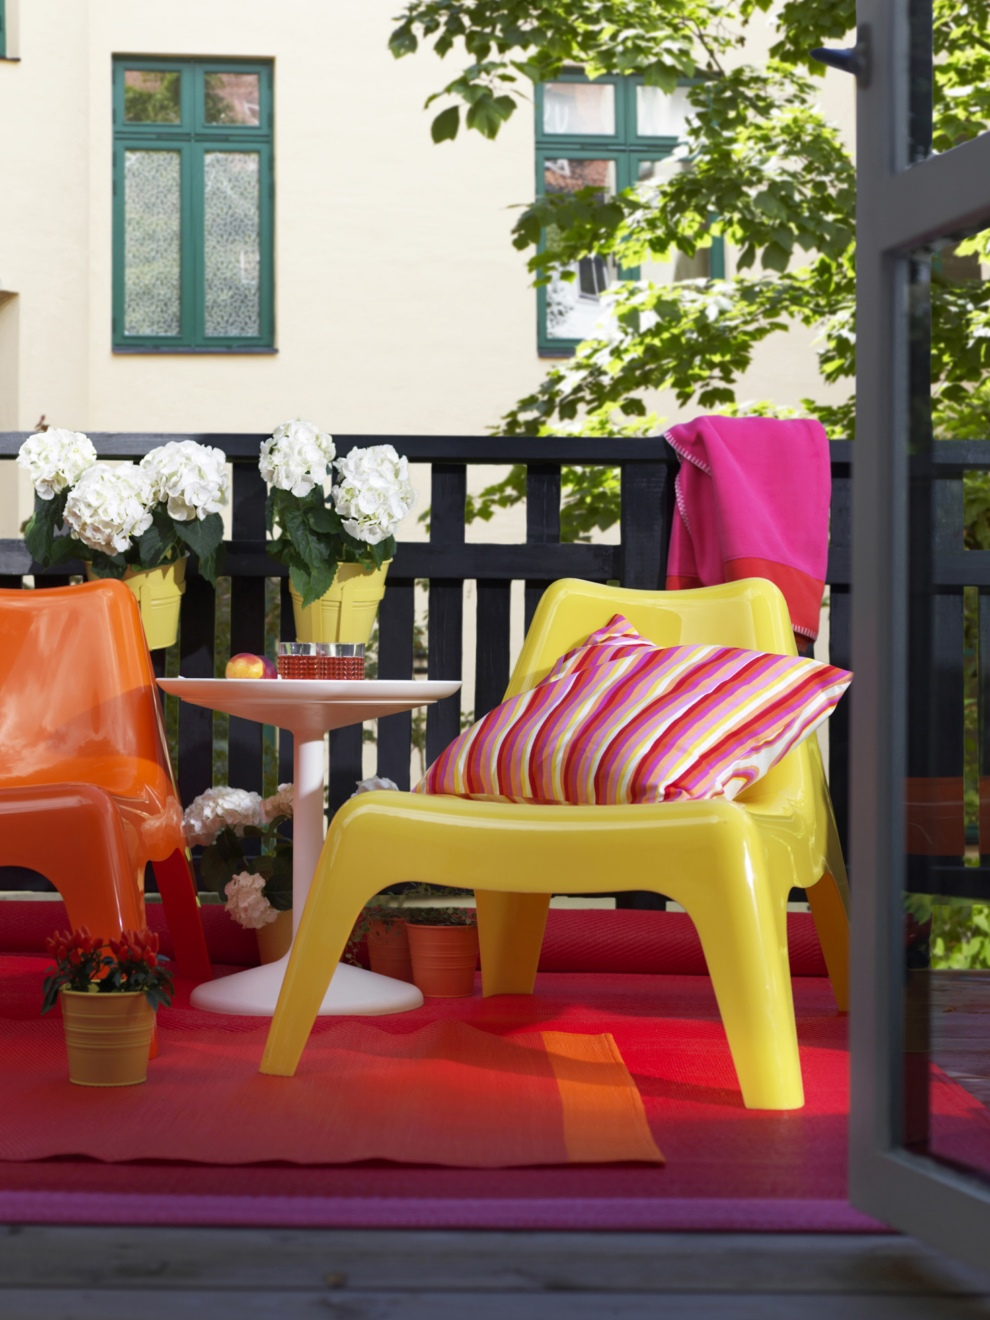 Muebles ikea exterior 33 revista muebles mobiliario de for Ikea muebles de exterior